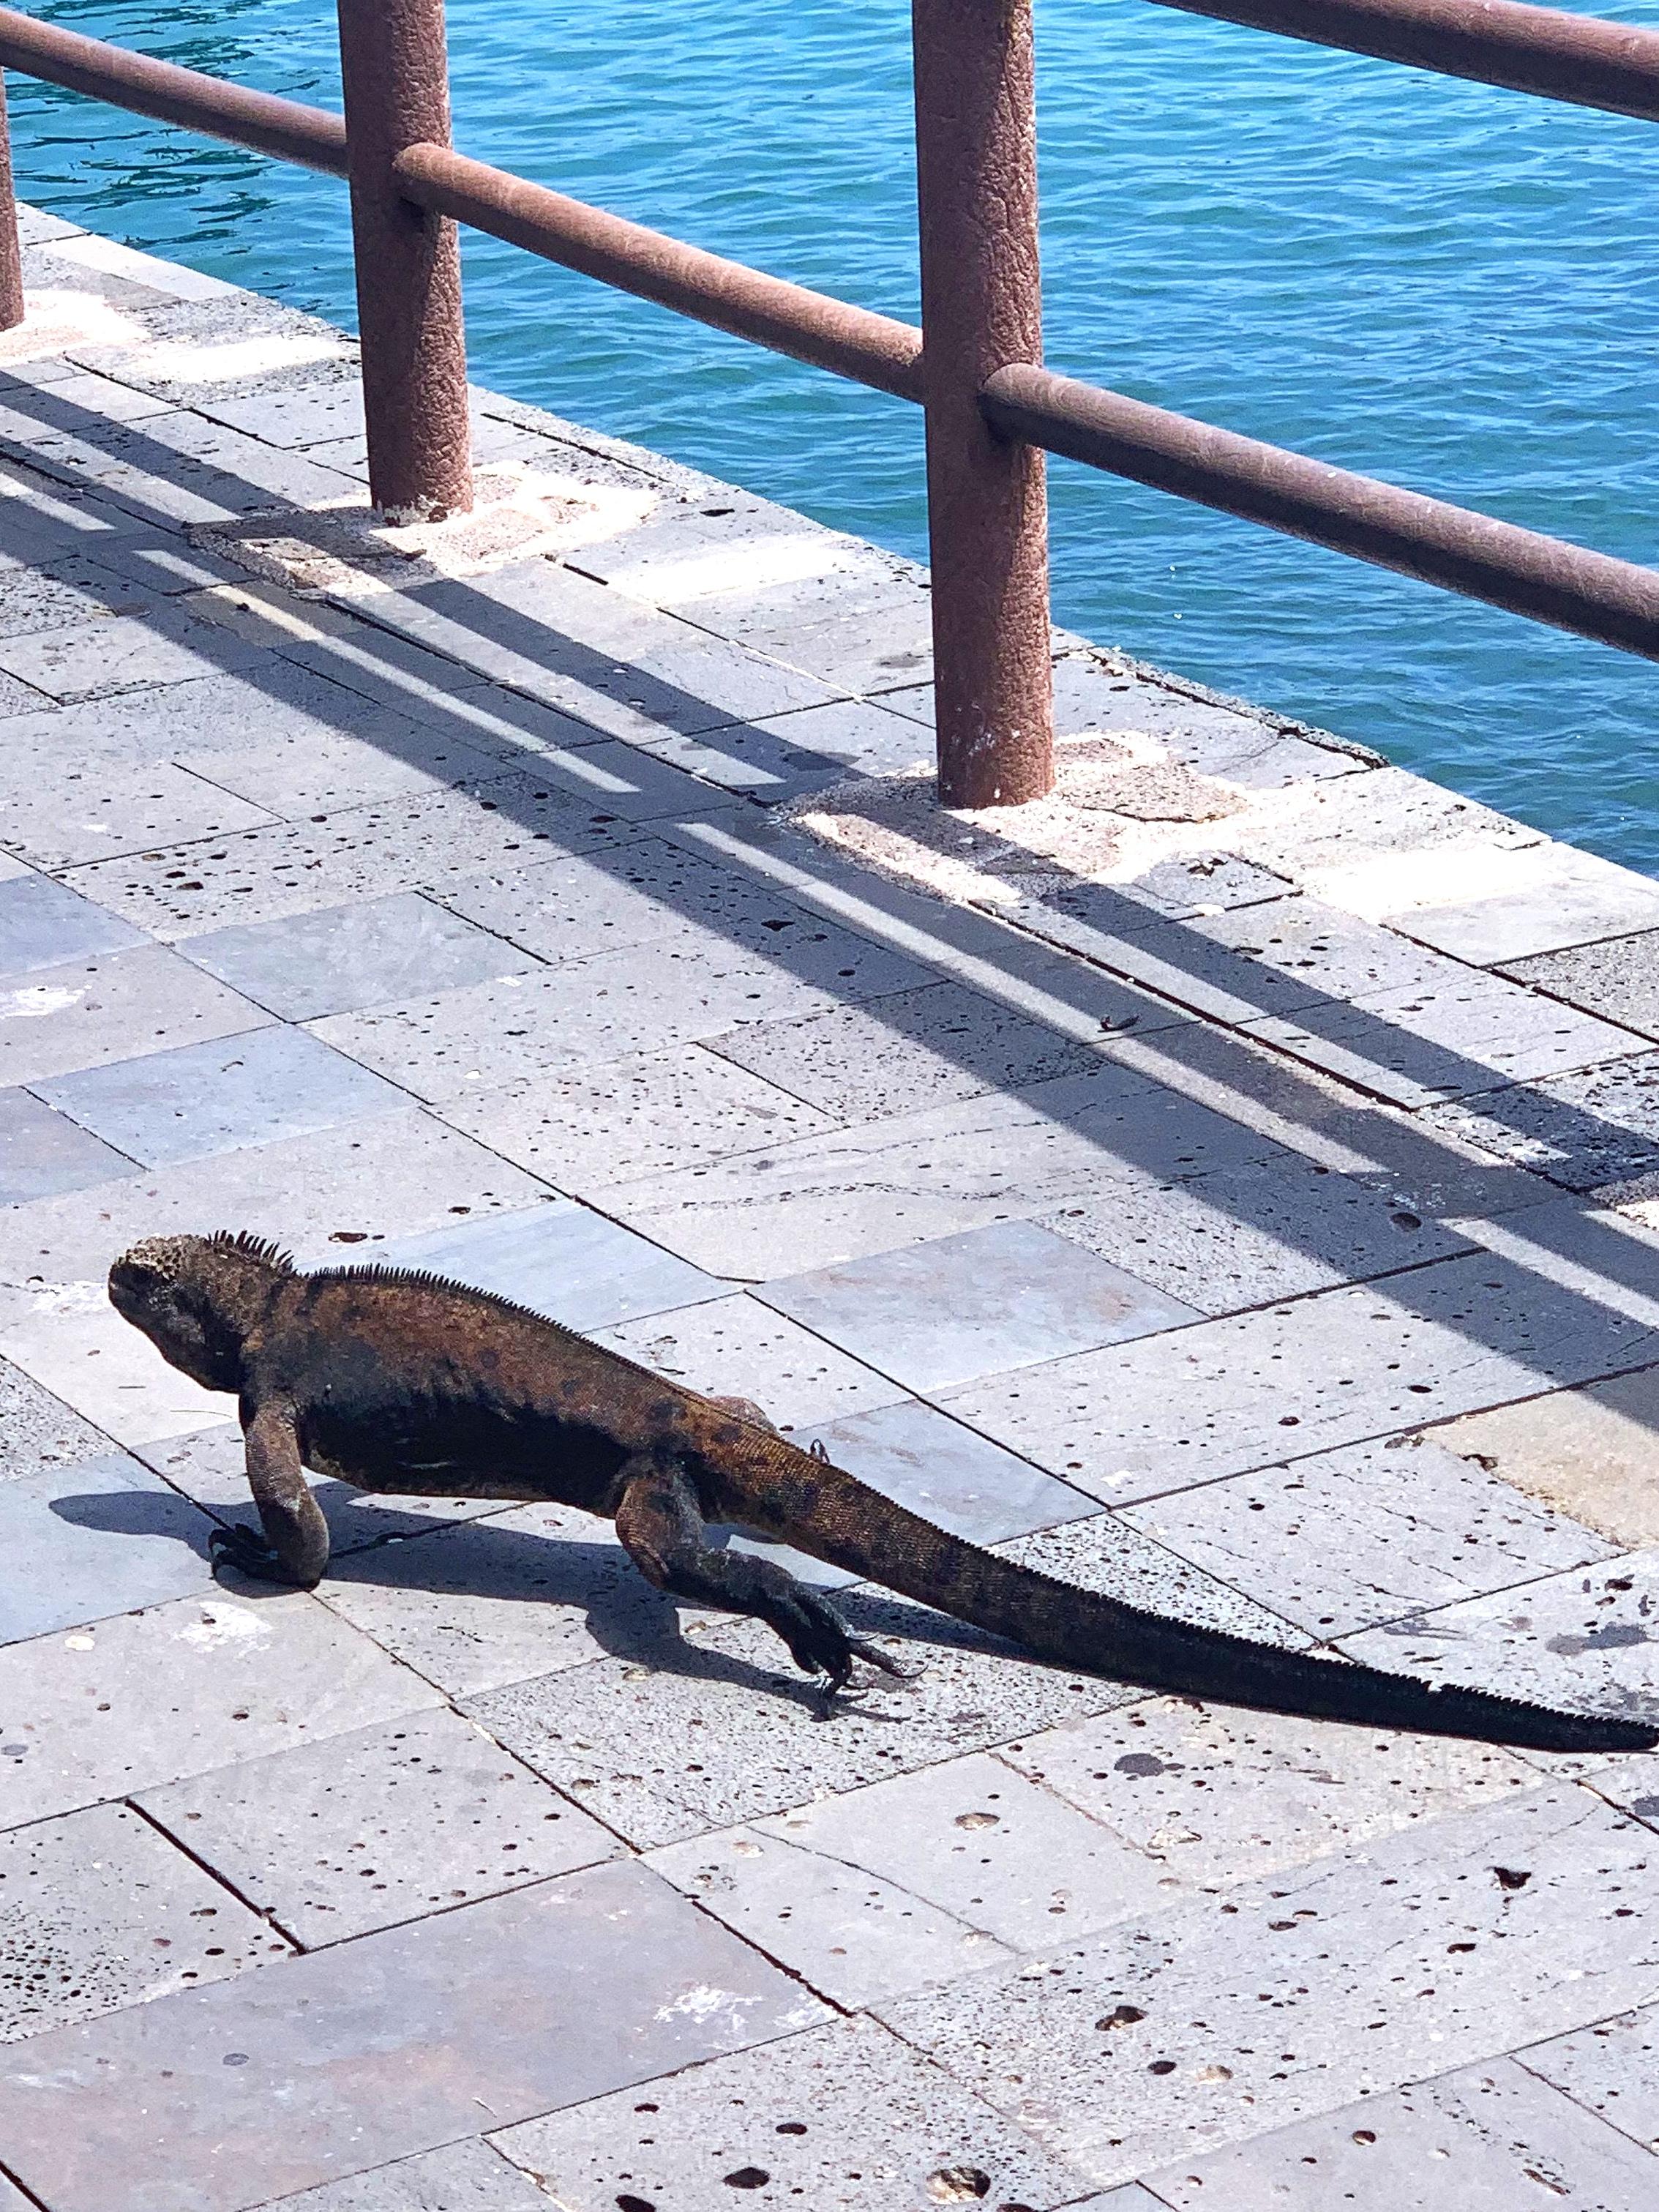 Sharing the sidewalk with marine iguanas.